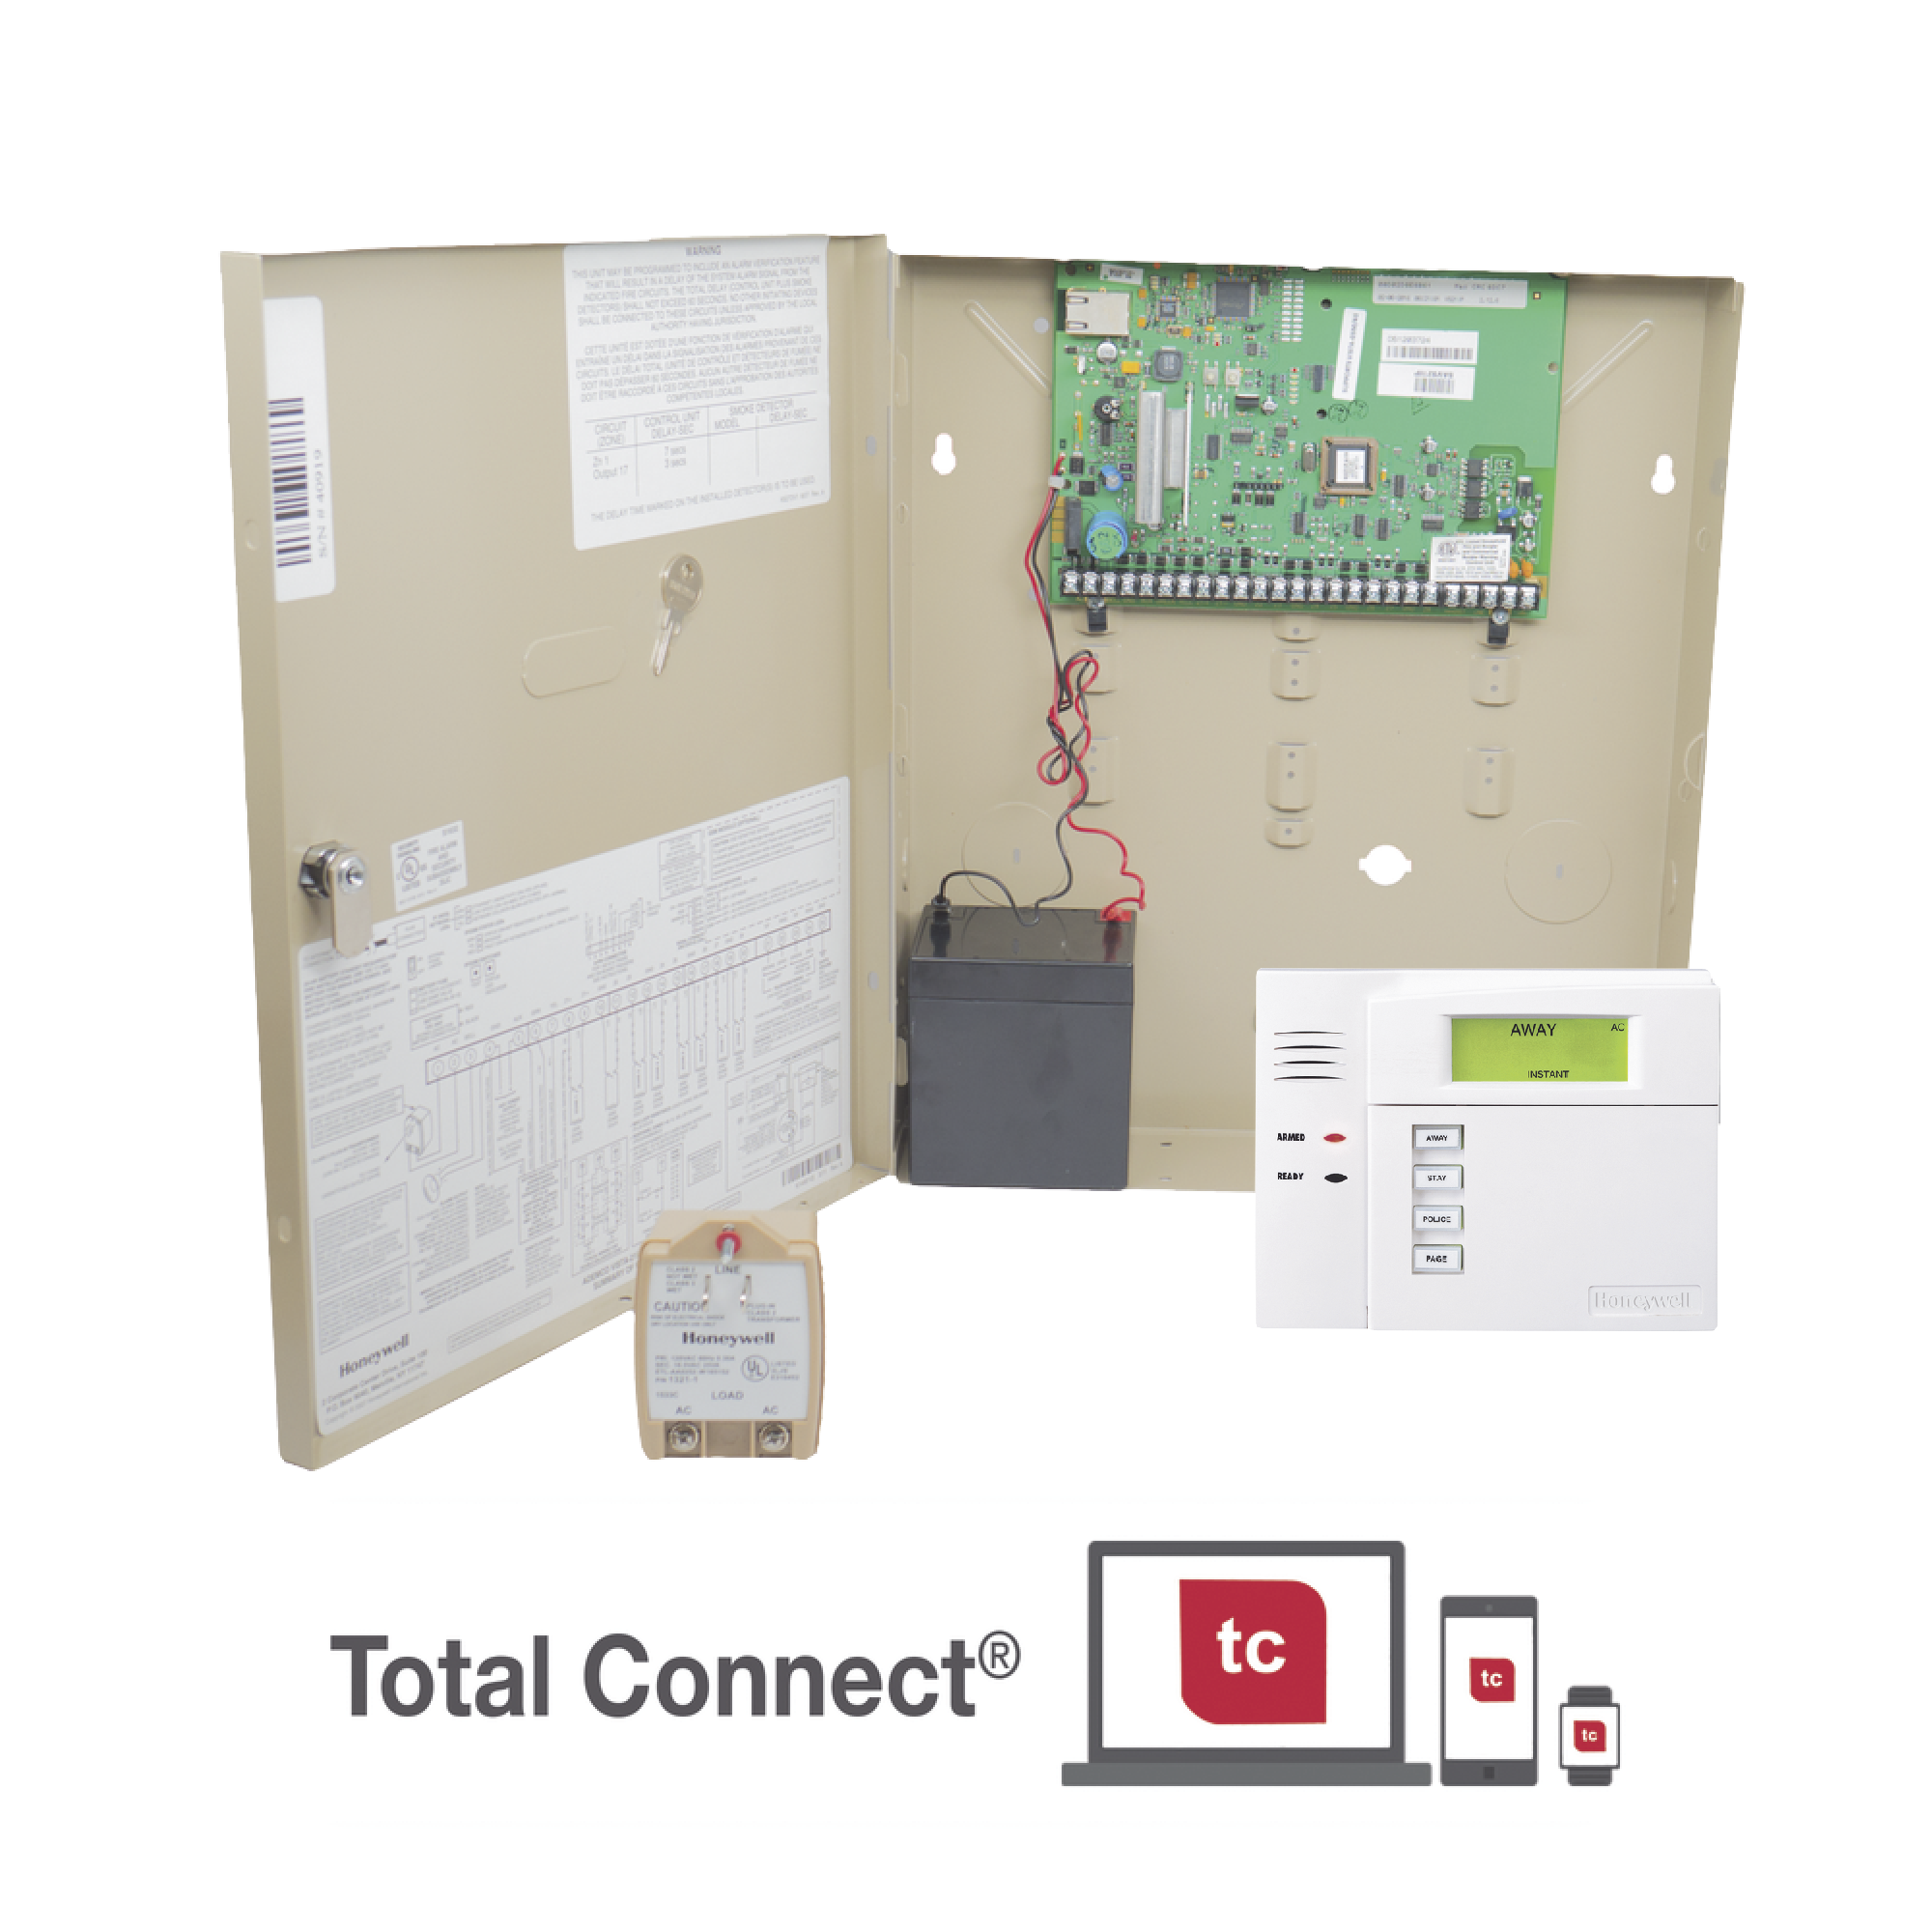 Panel de Alarma Residencial/Comercial VISTA 21IP con Módulo IP incluído para conexión a AlarmNet